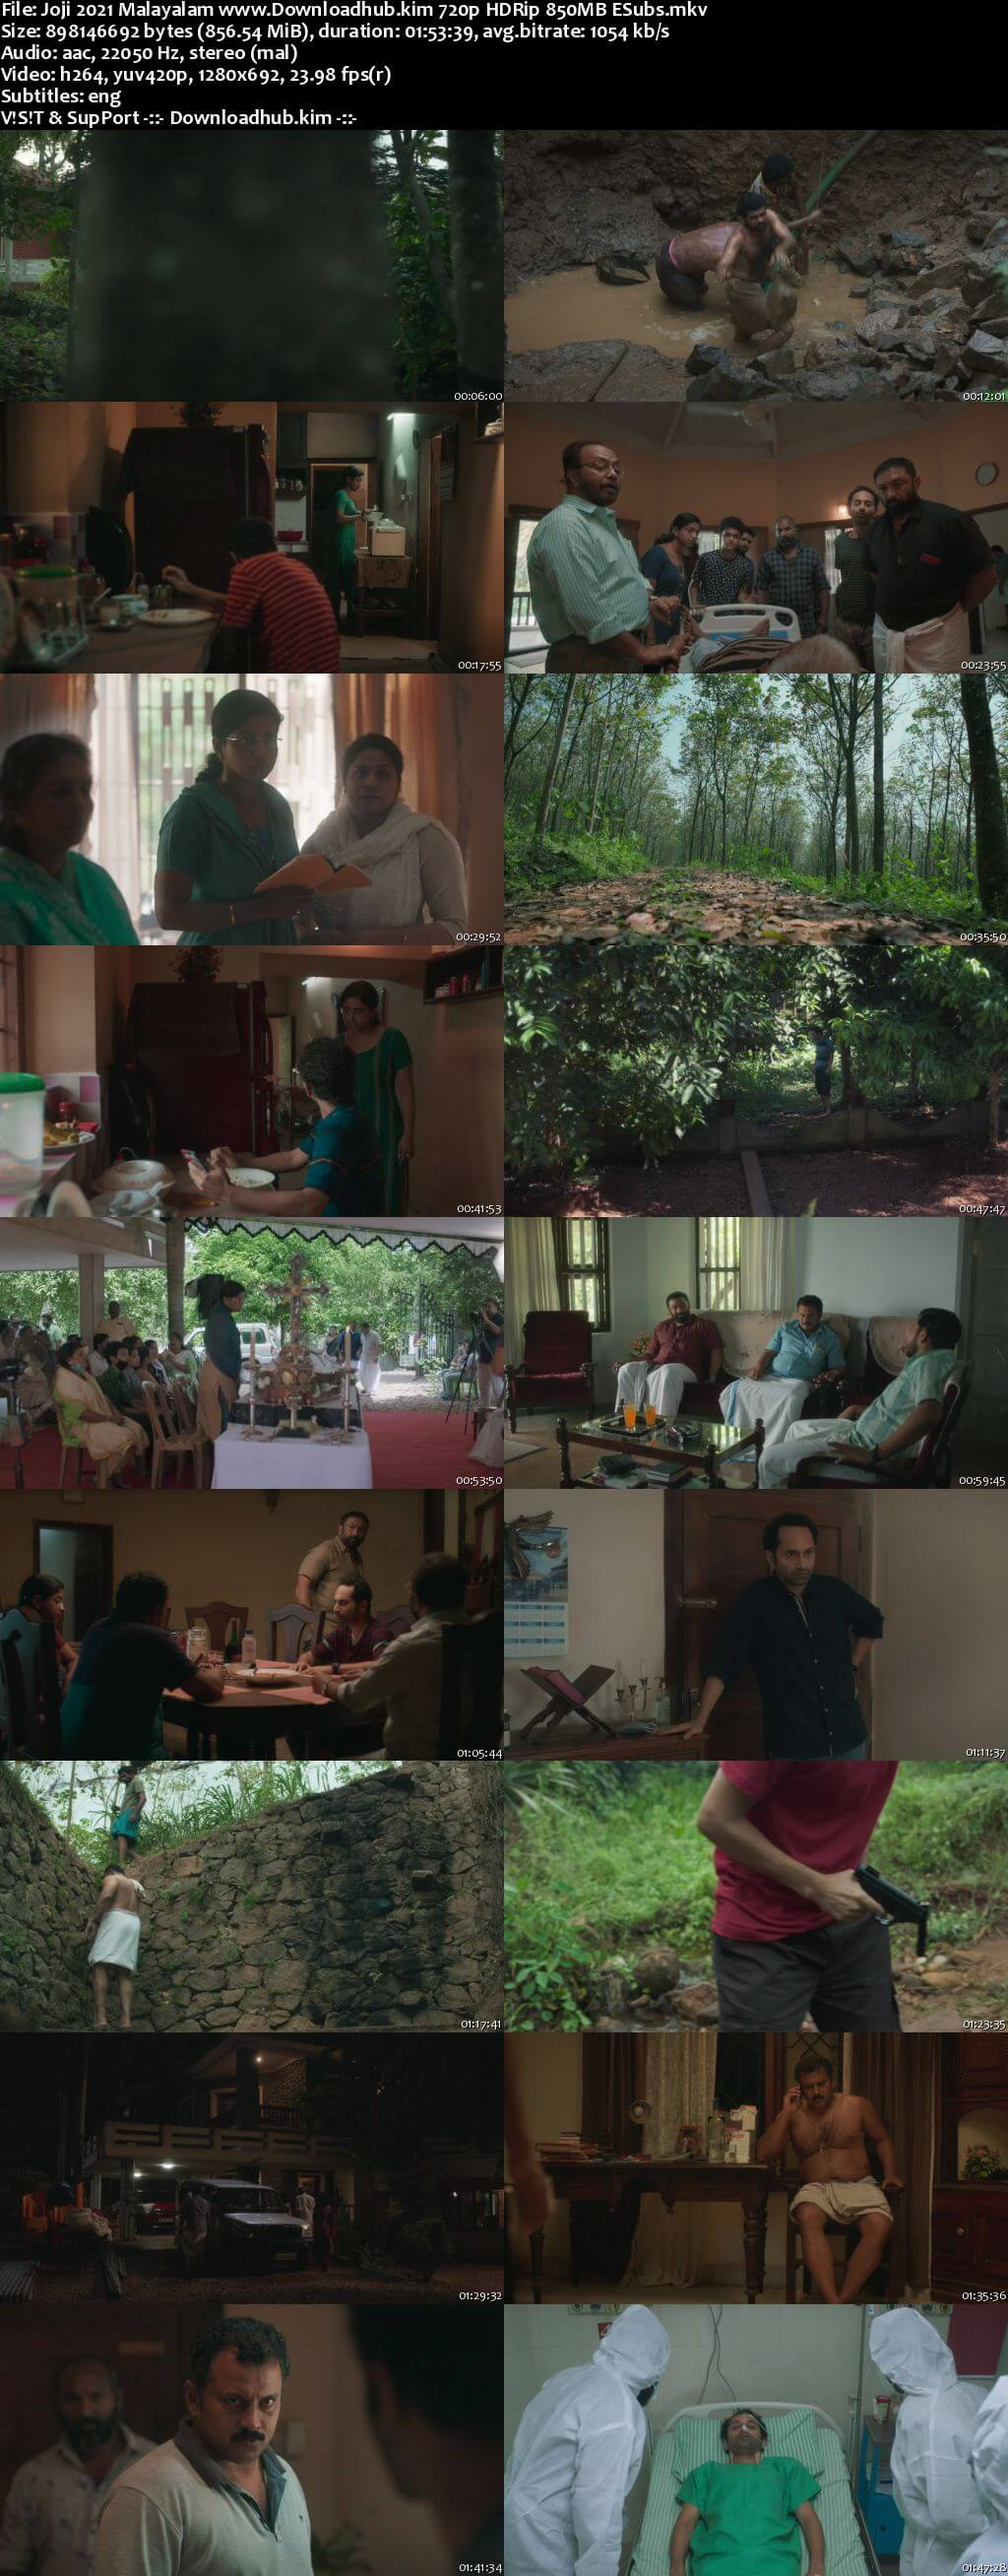 Joji 2021 Malayalam 720p HDRip ESubs